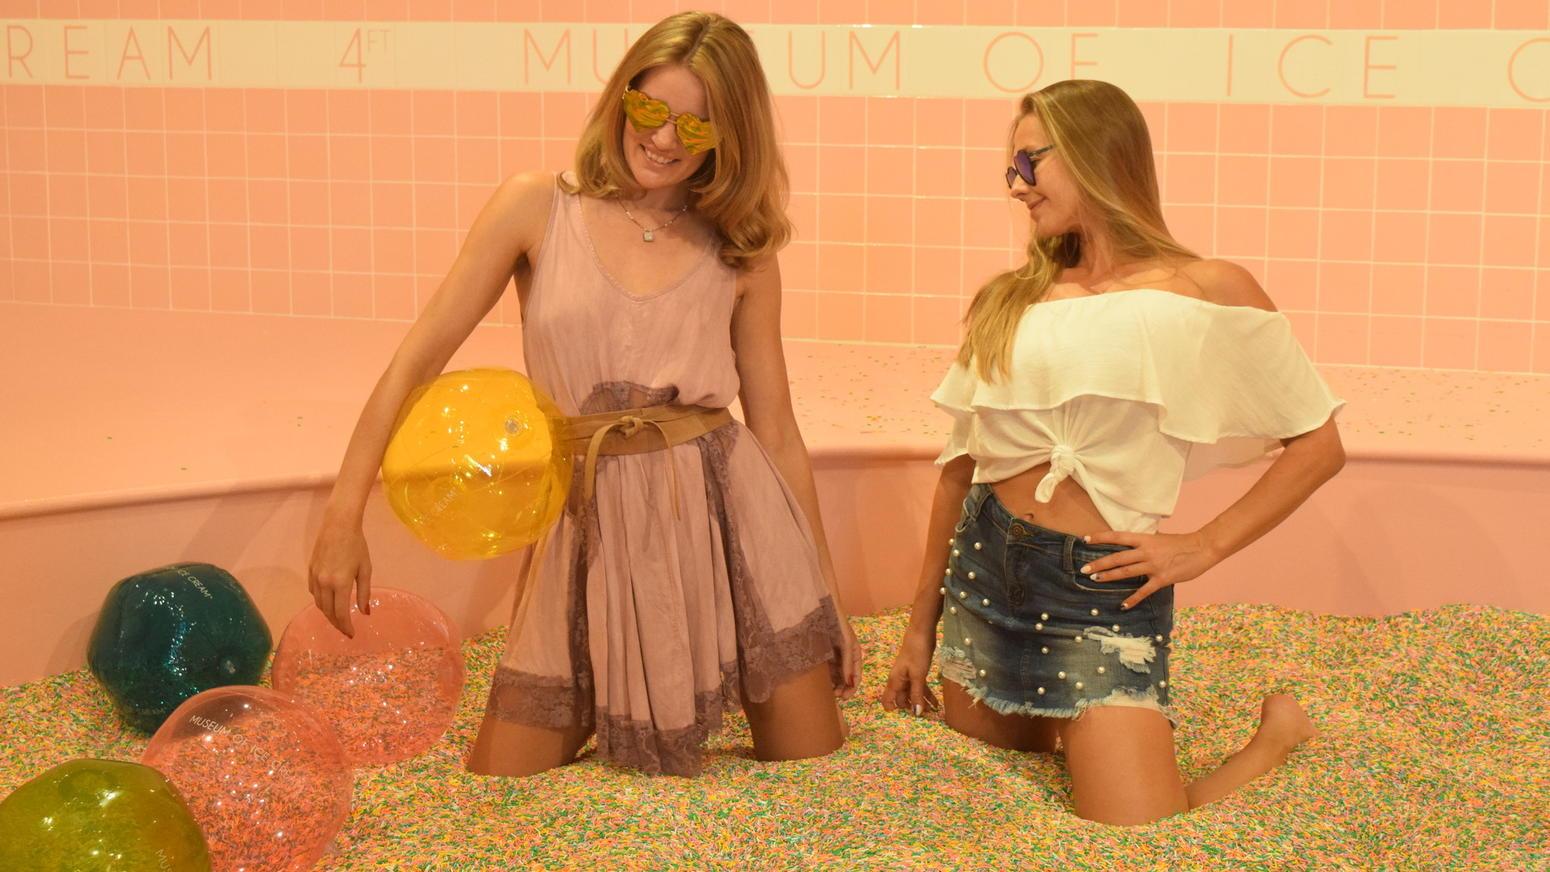 sfl-art-basel-2017-museum-ice-cream-photos-026